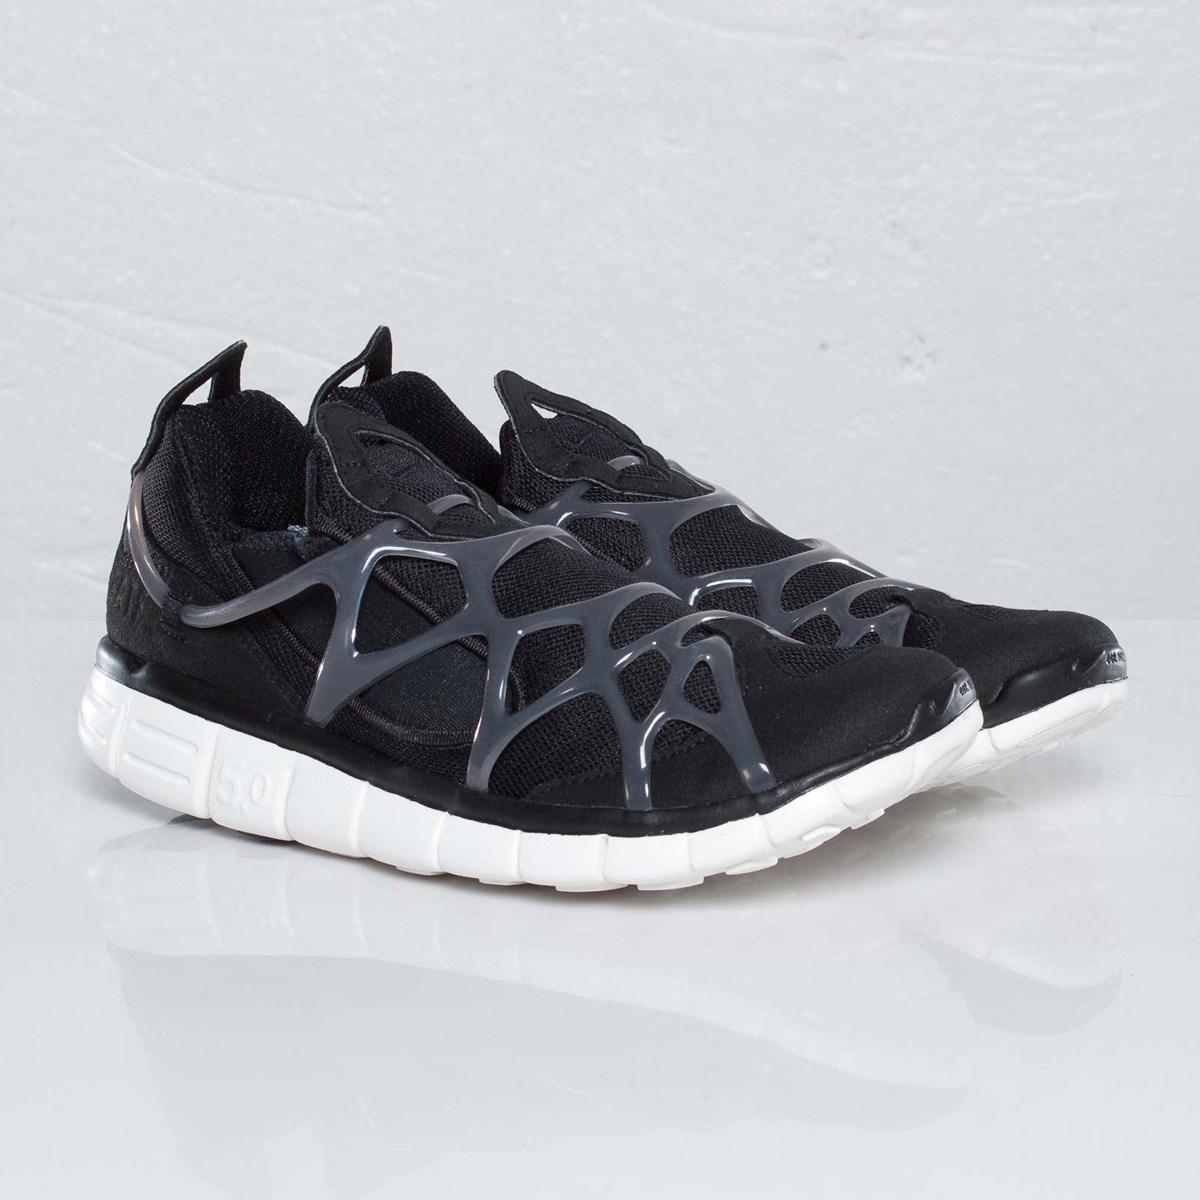 Free Streetwear SneakersnstuffSneakersamp; Nike Kukini 109966 CrBxode